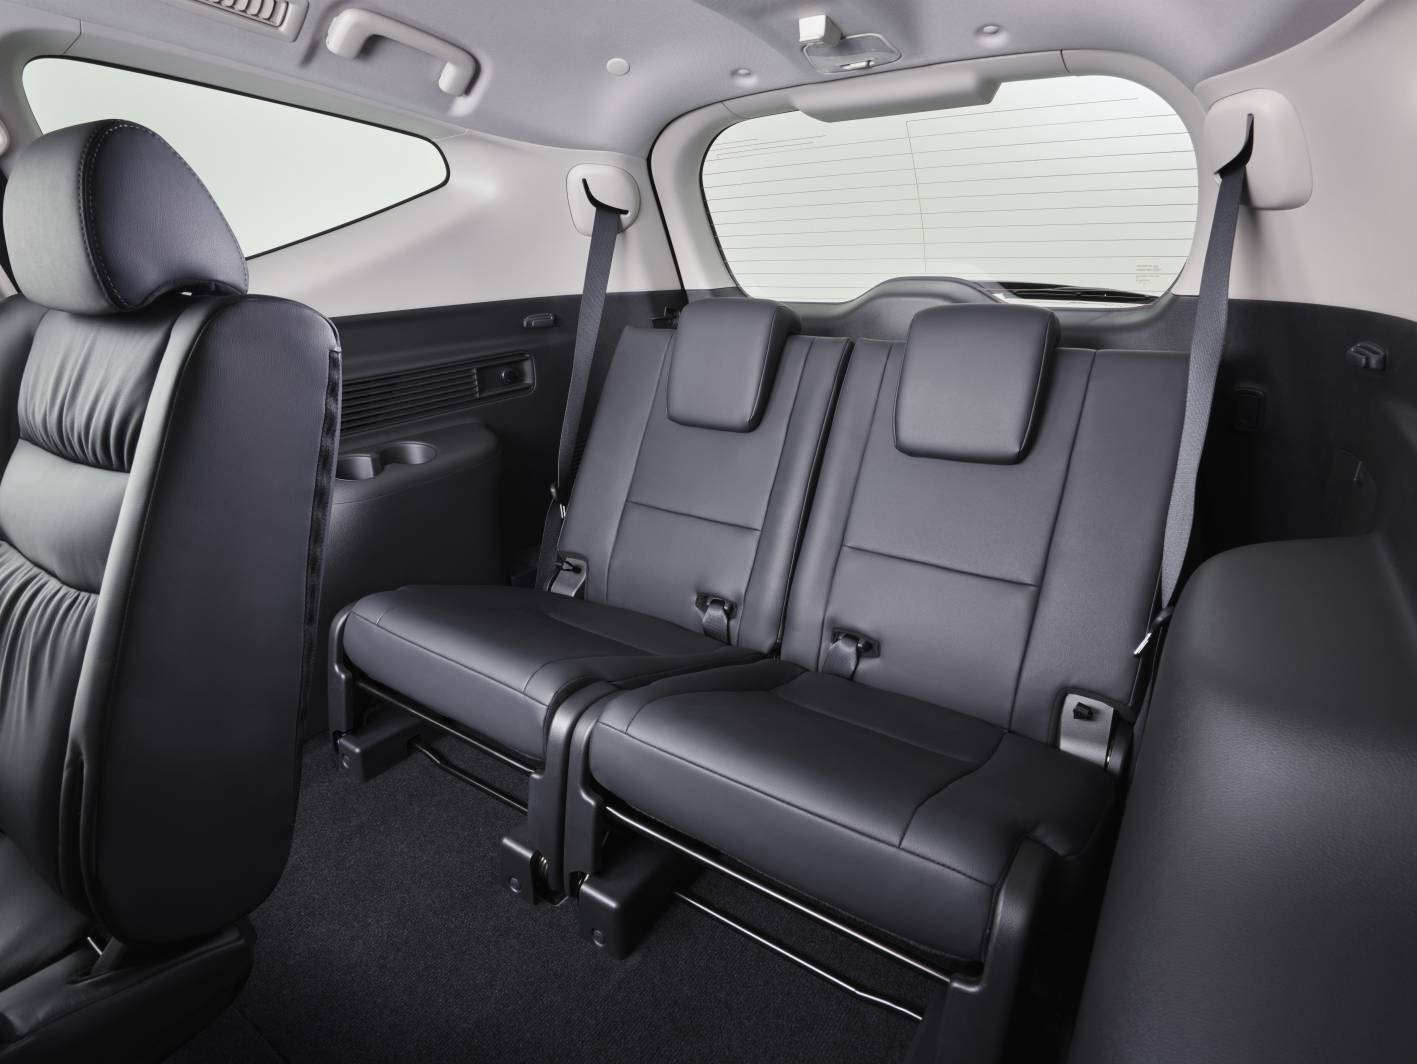 2019 Mitsubishi Pajero Sport Review